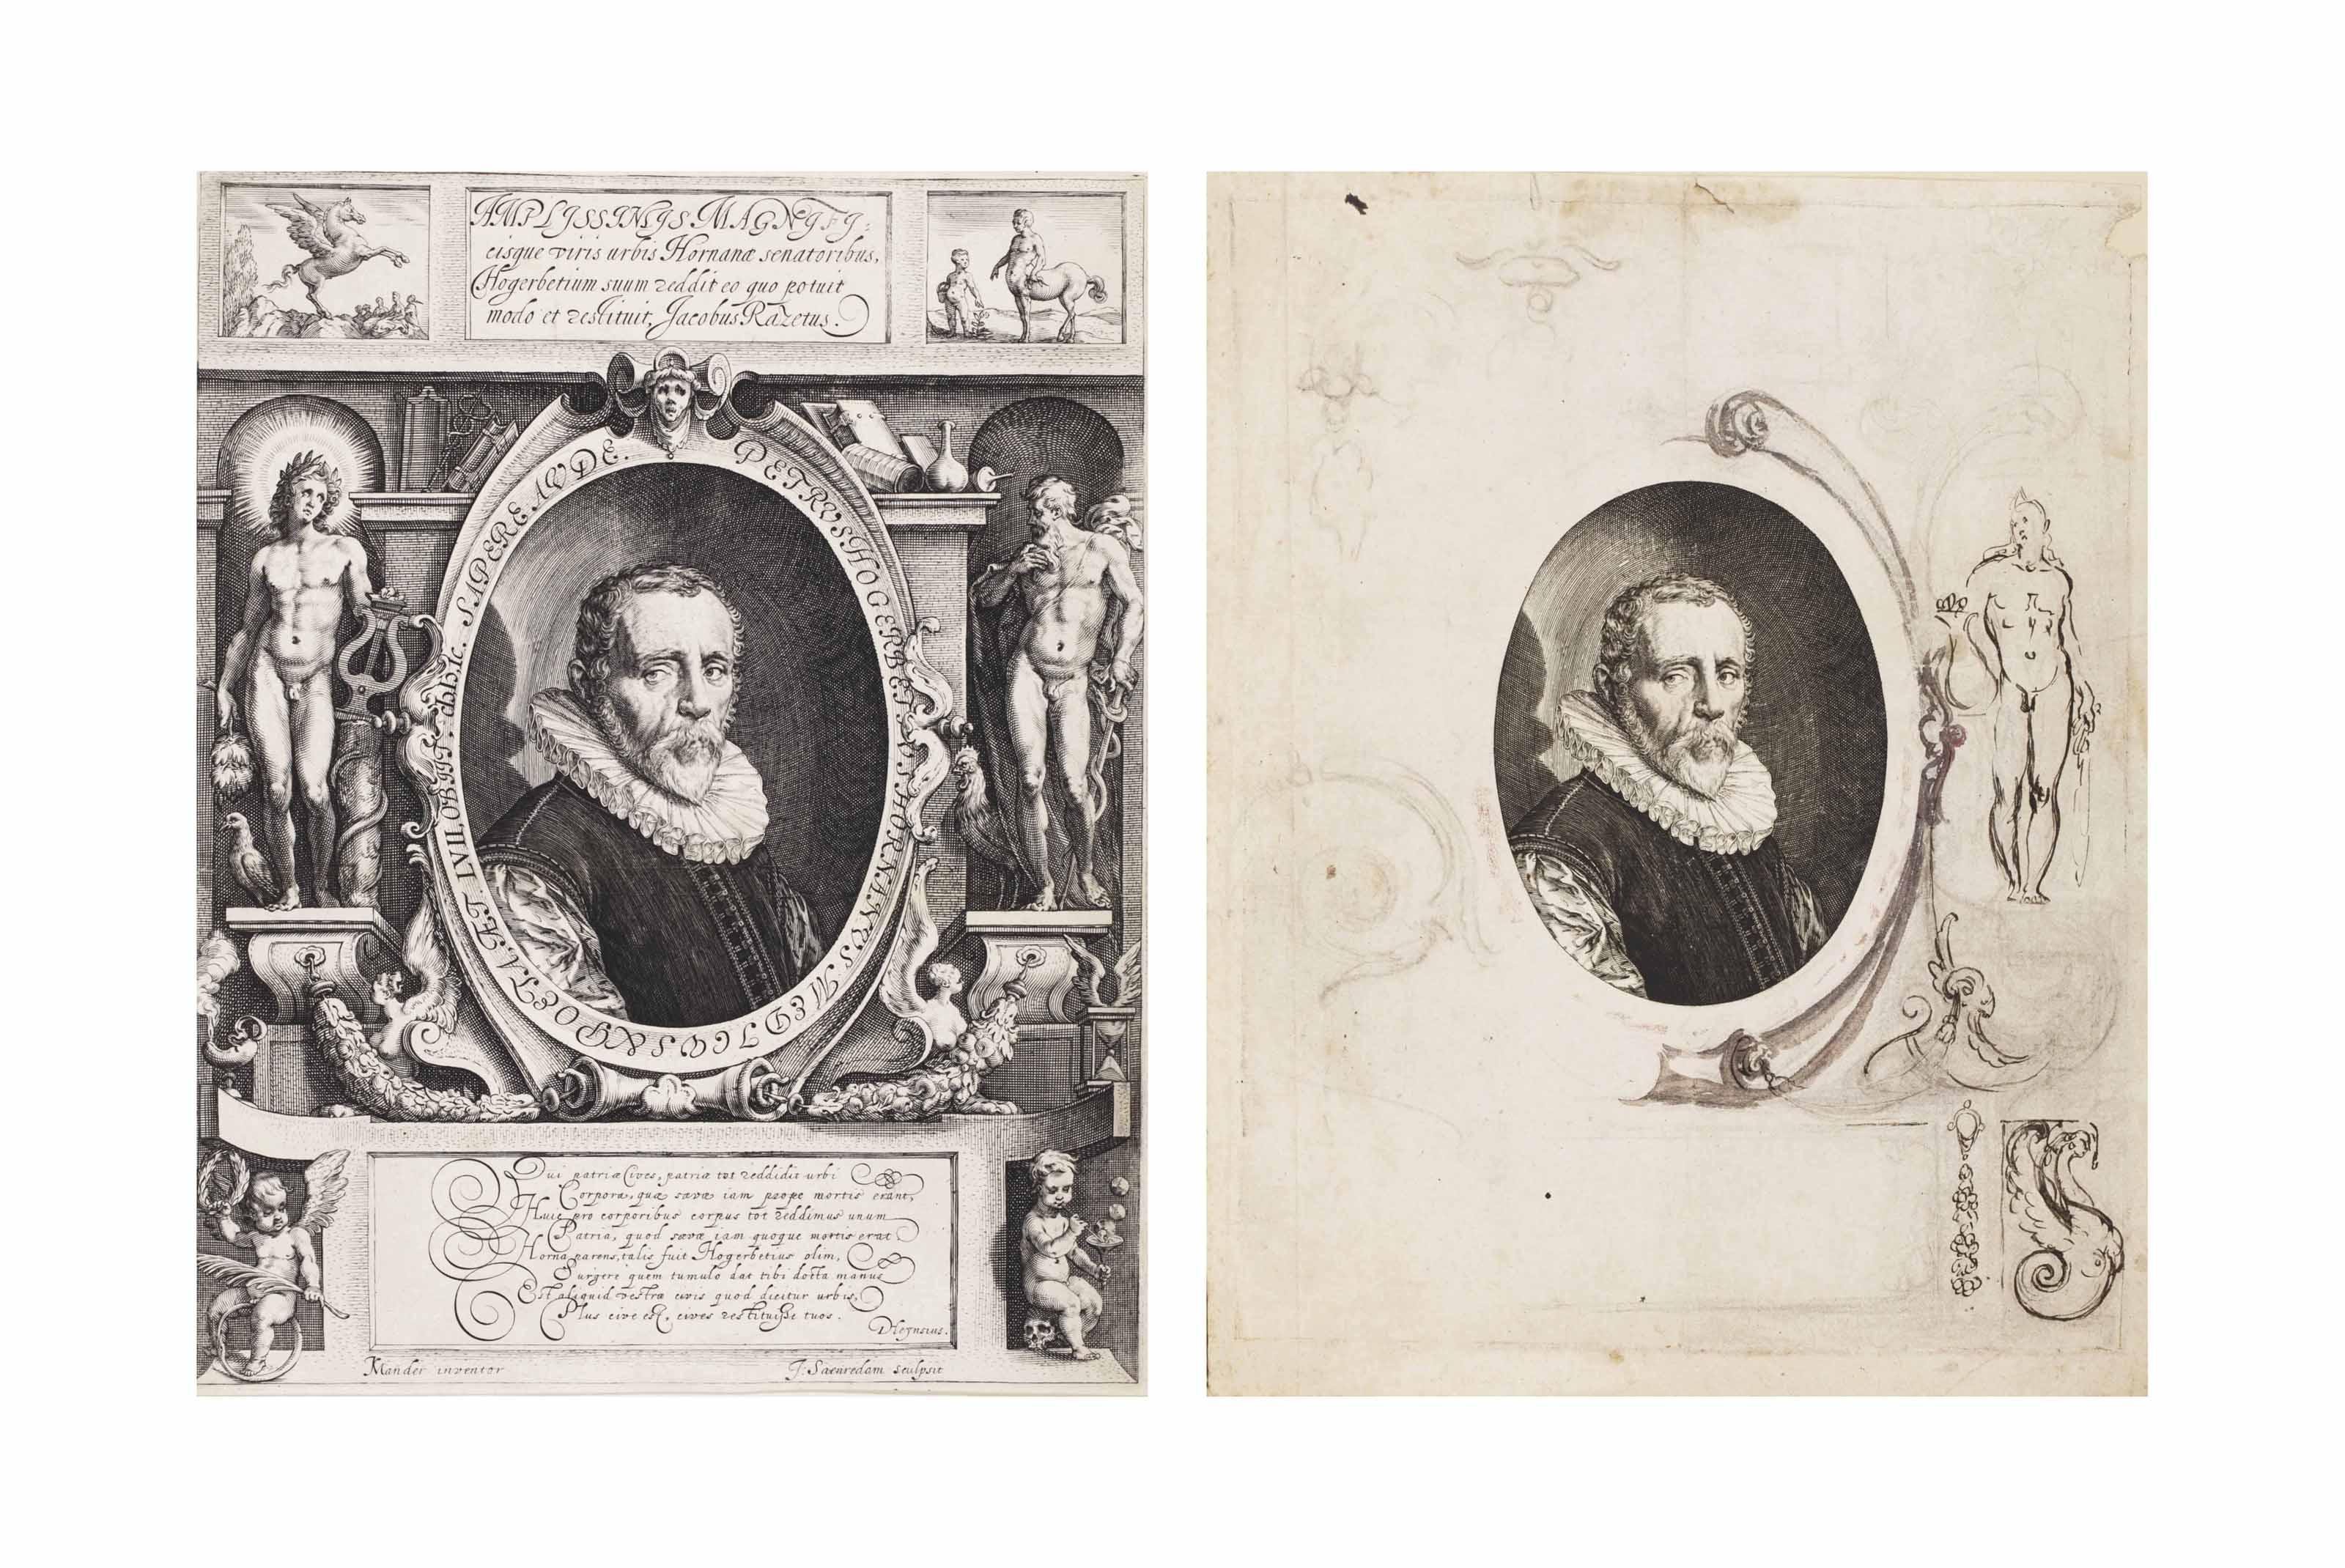 Karel van Mander (Meulbeke 1548-1606 Amsterdam)